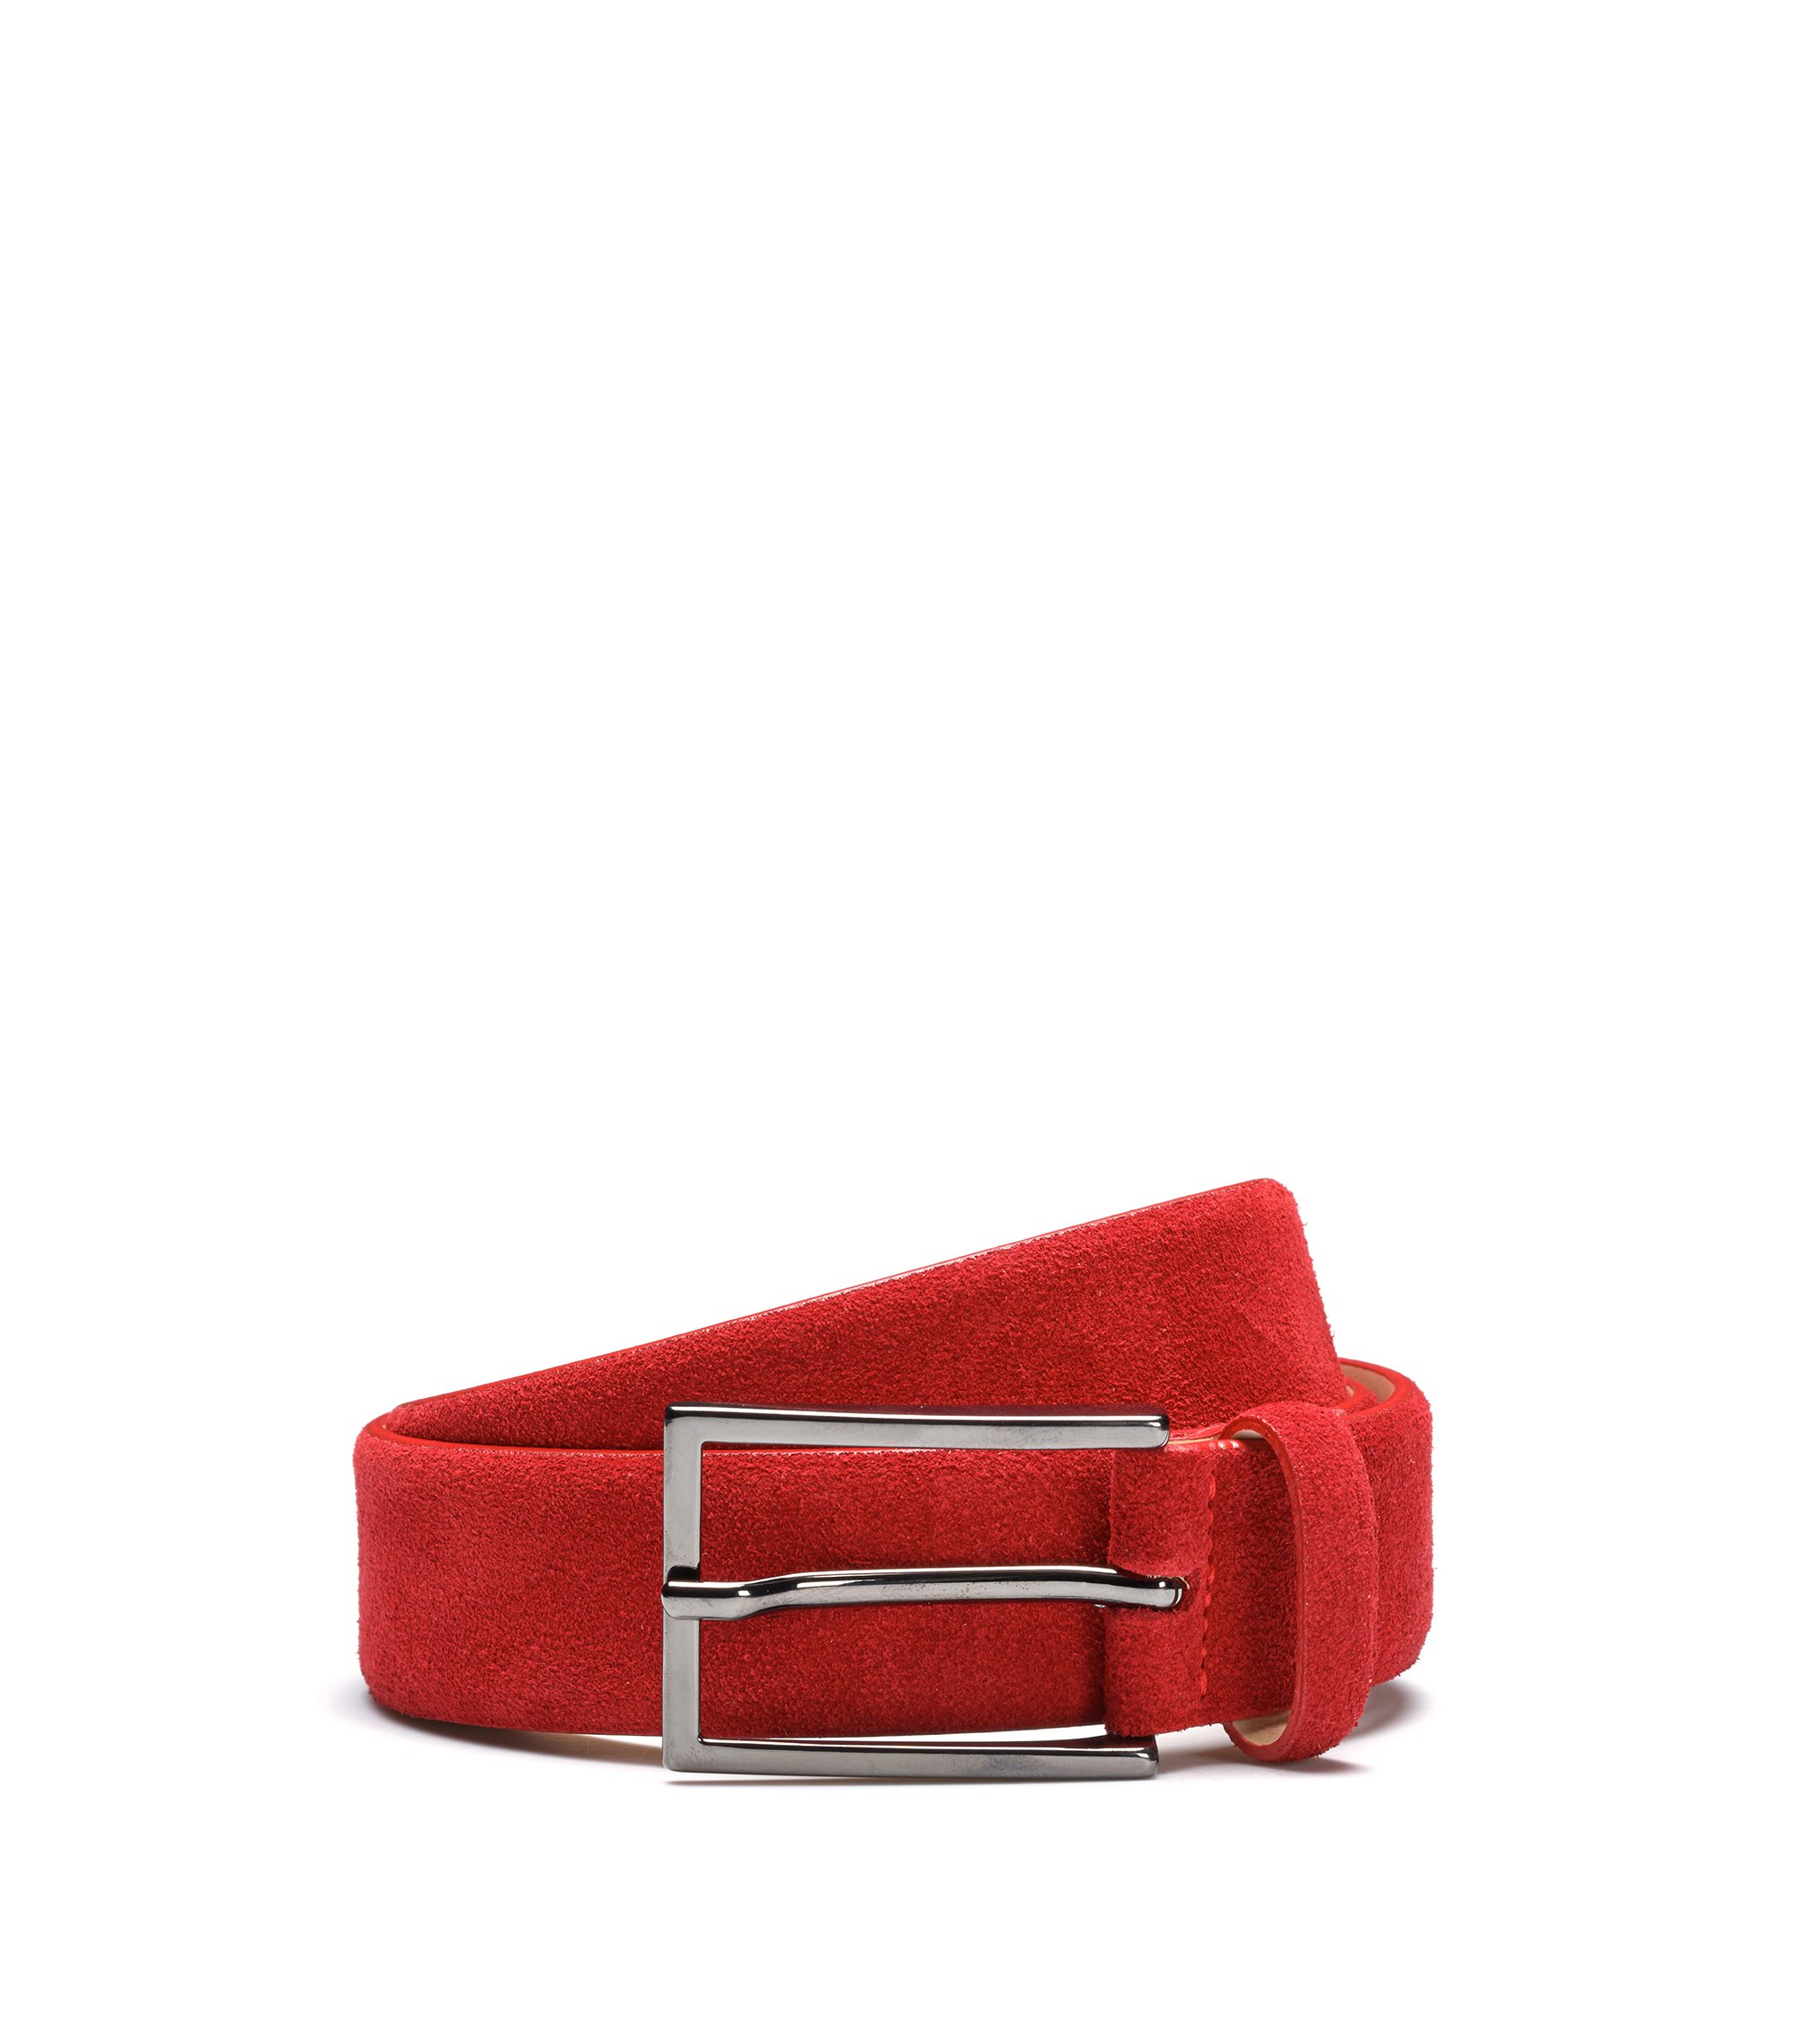 Cintura in pelle scamosciata con cucitura esclusiva, Rosso